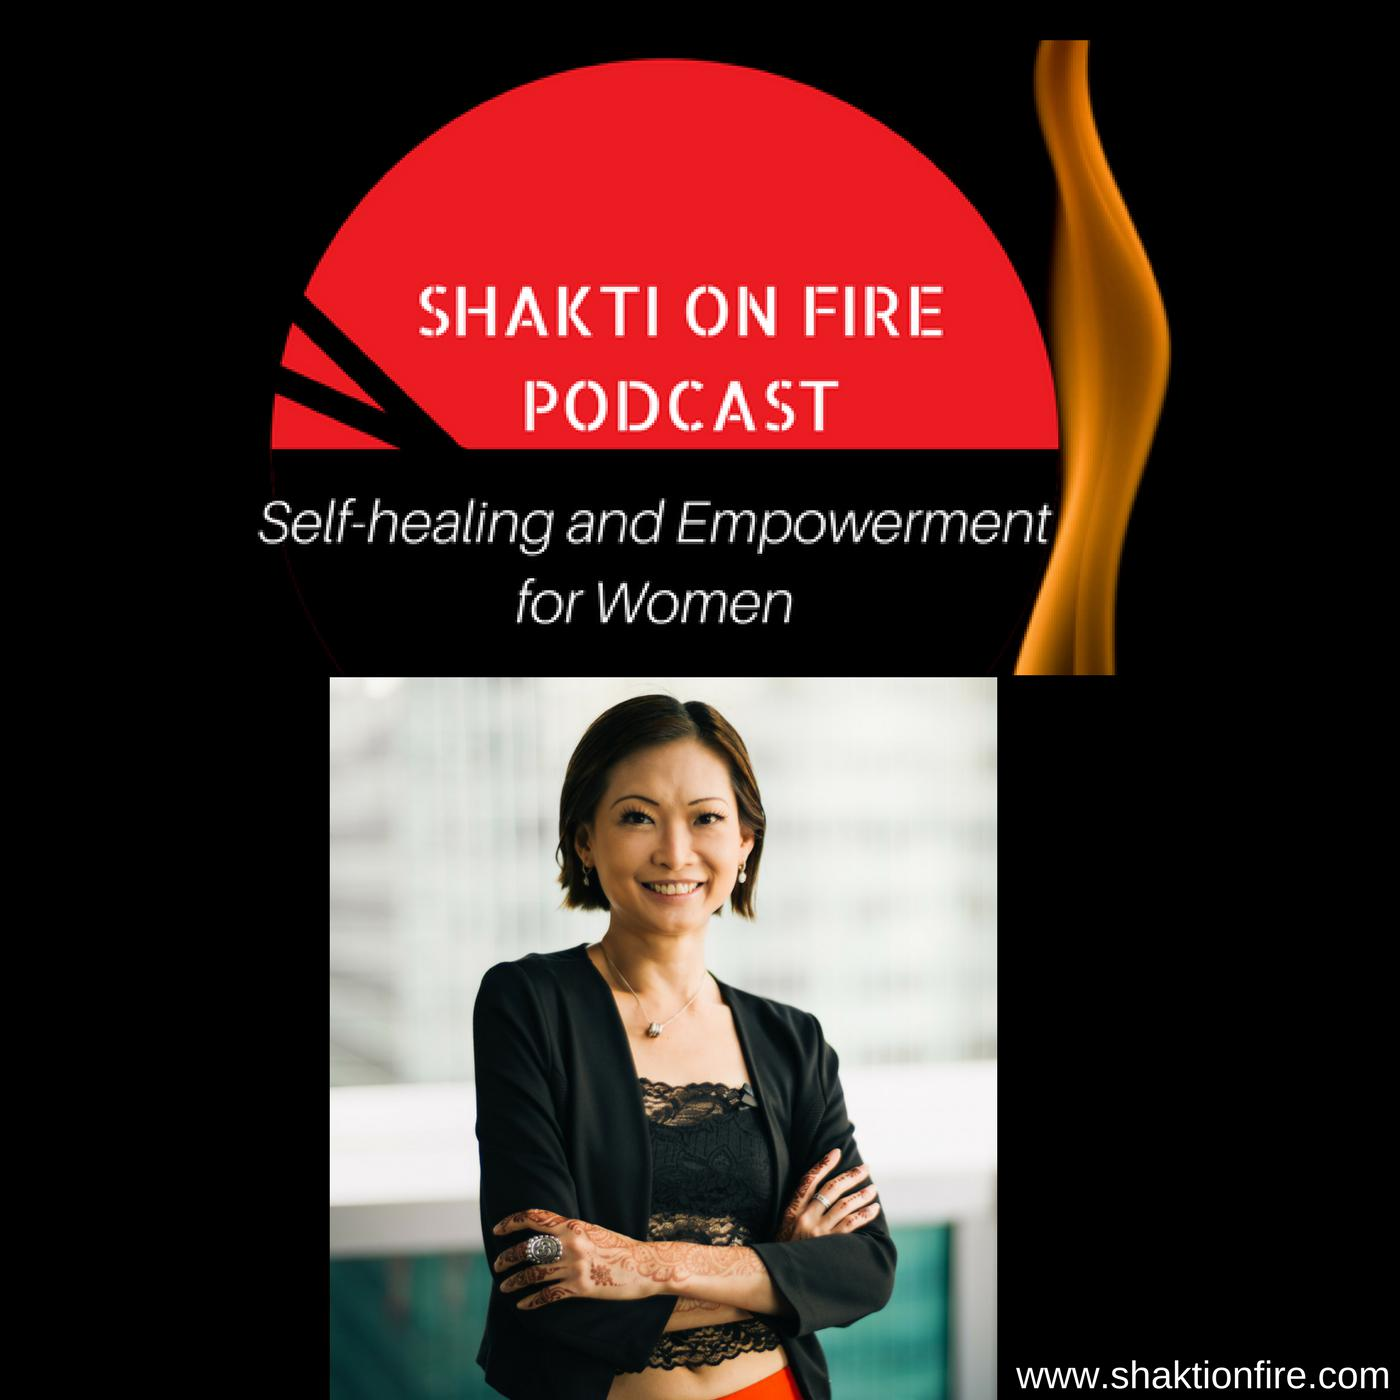 Shakti on Fire Podcast - Joy Leng, empowerment coach, author, healer